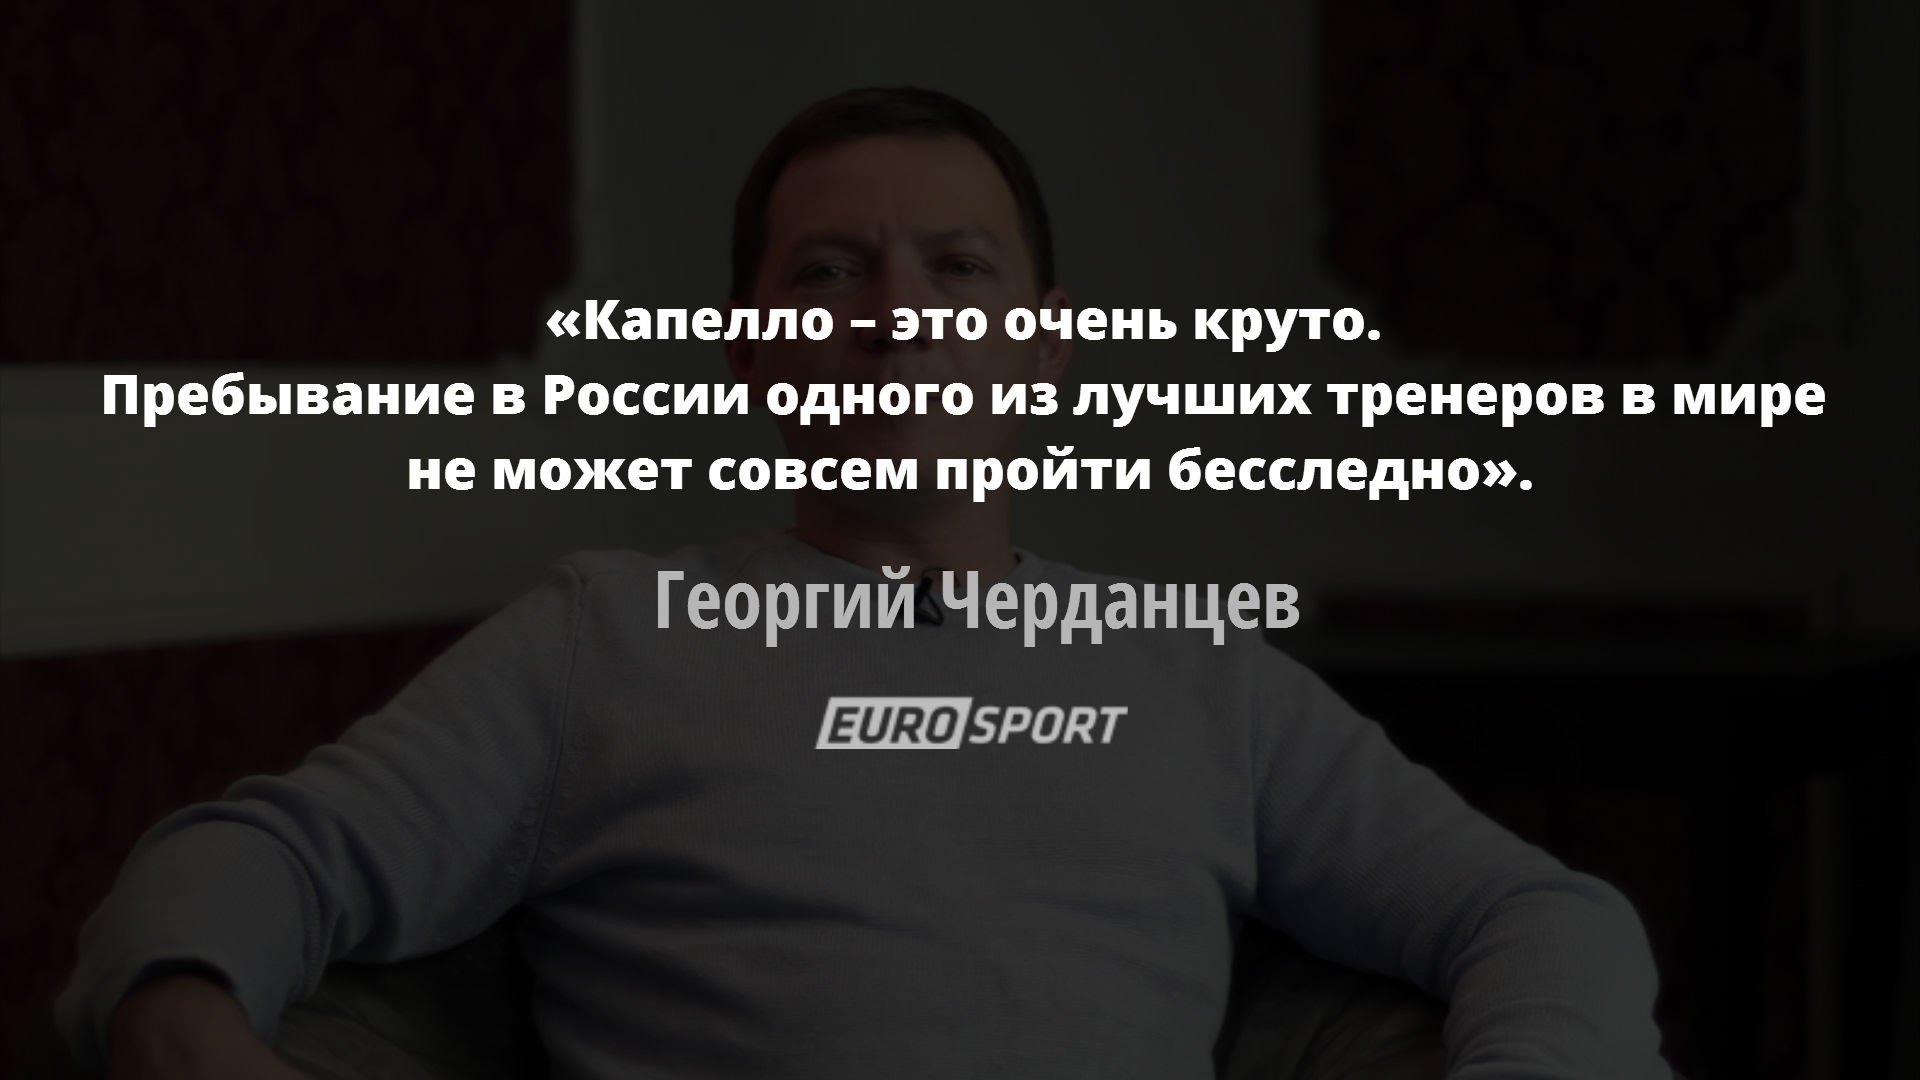 https://i.eurosport.com/2015/07/13/1639143.jpg